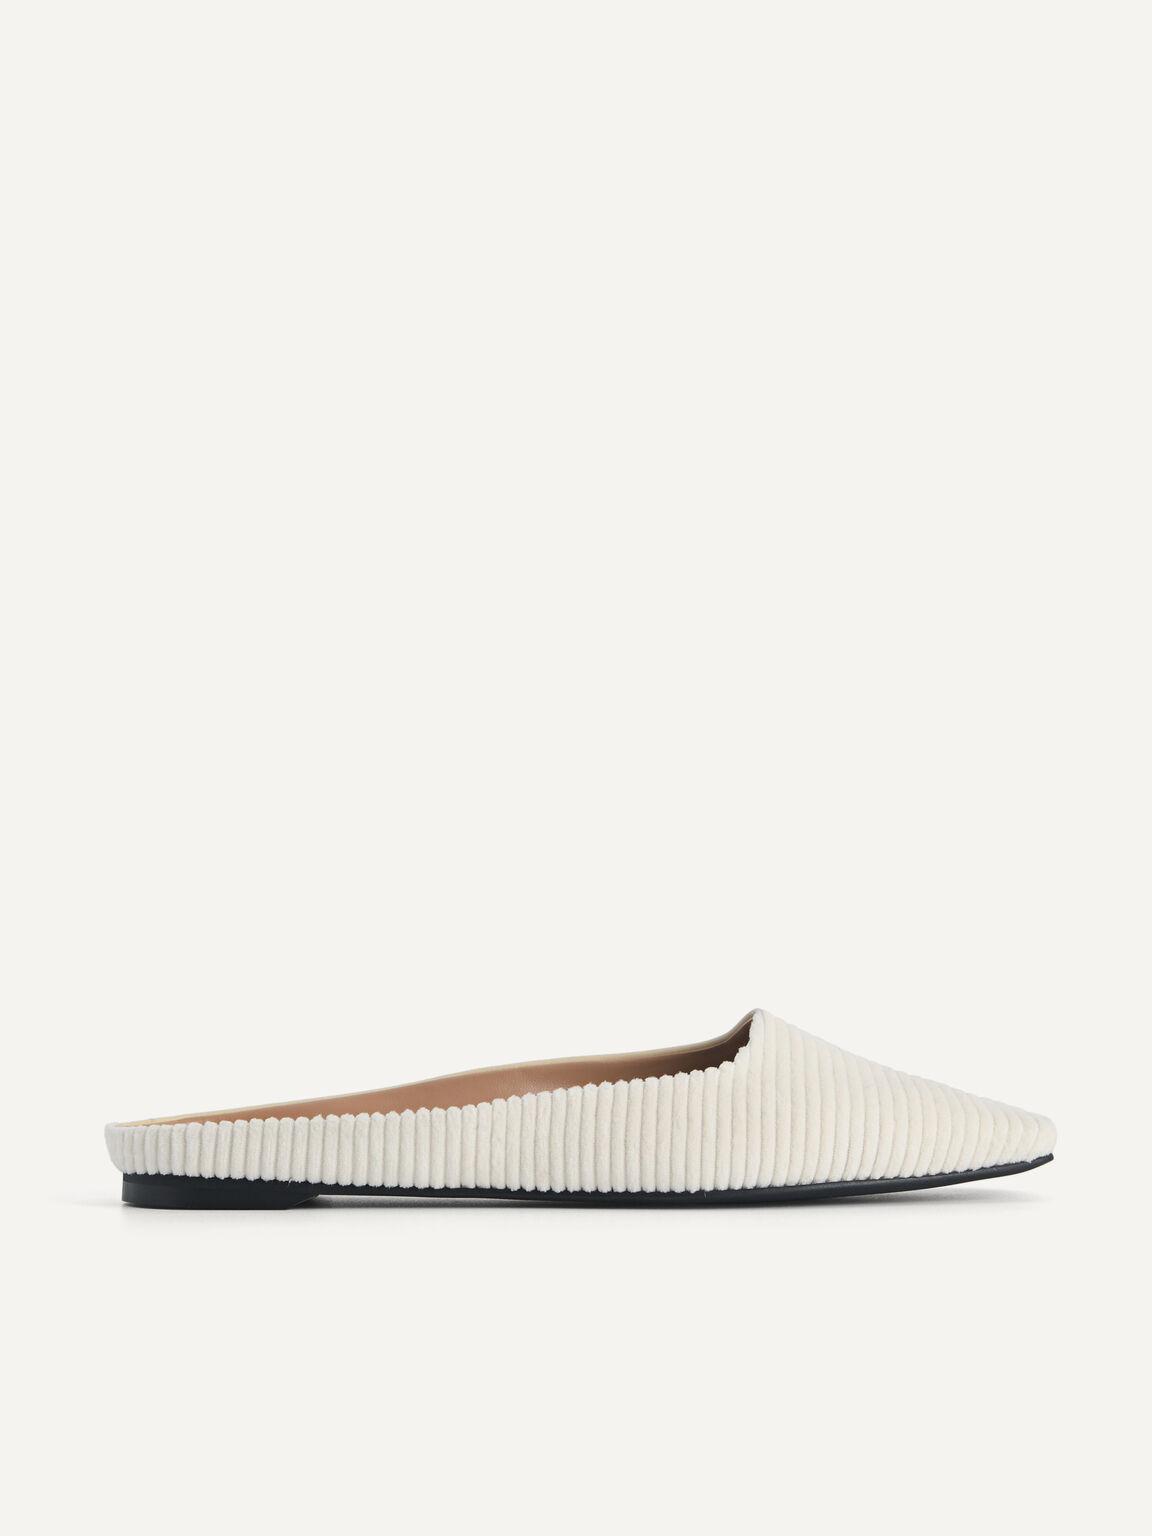 Corduroy Slip-On Flats, Beige, hi-res